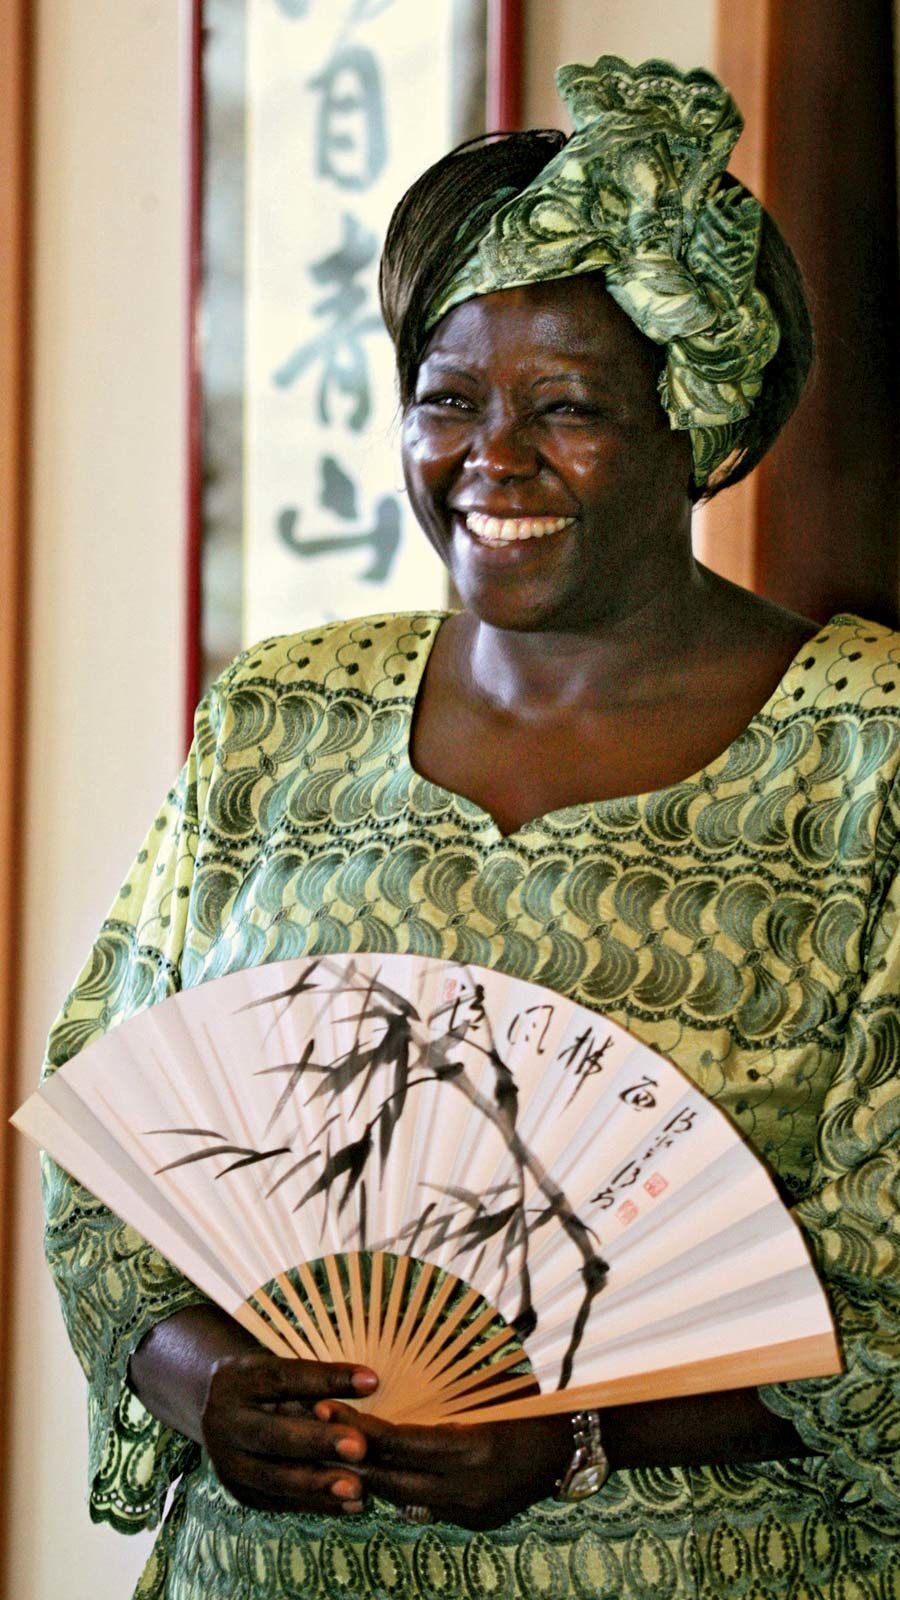 Wangari Maathai in green traditional dress and Japanese Fan